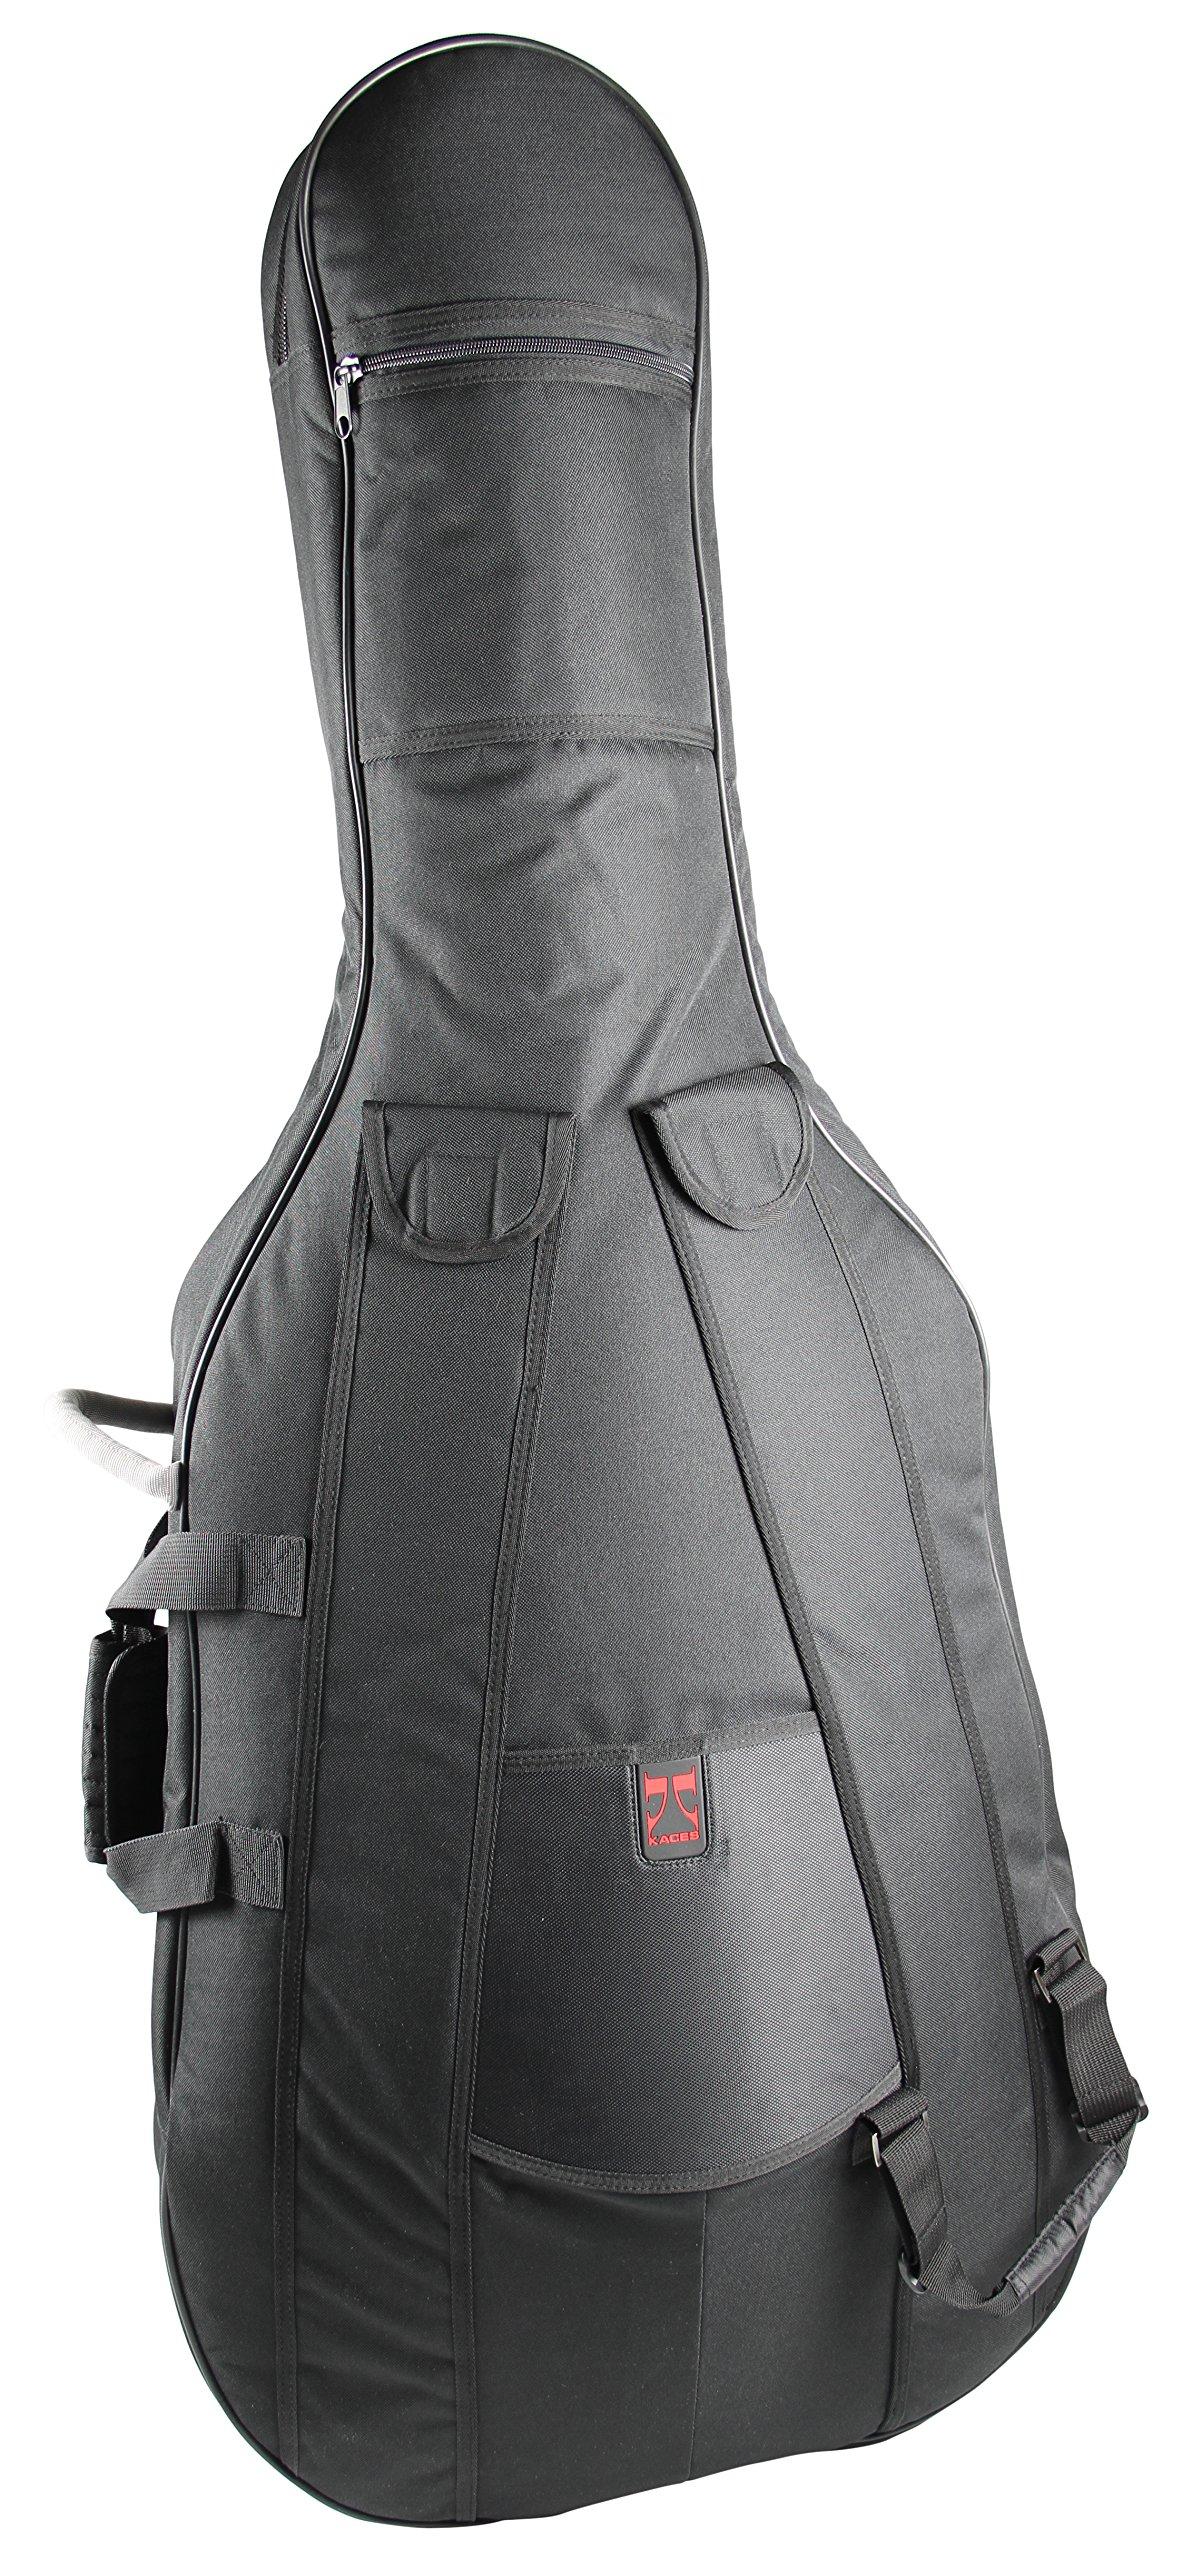 Kaces KCB4/4 4/4 Size Symphony Grade Cello Bag